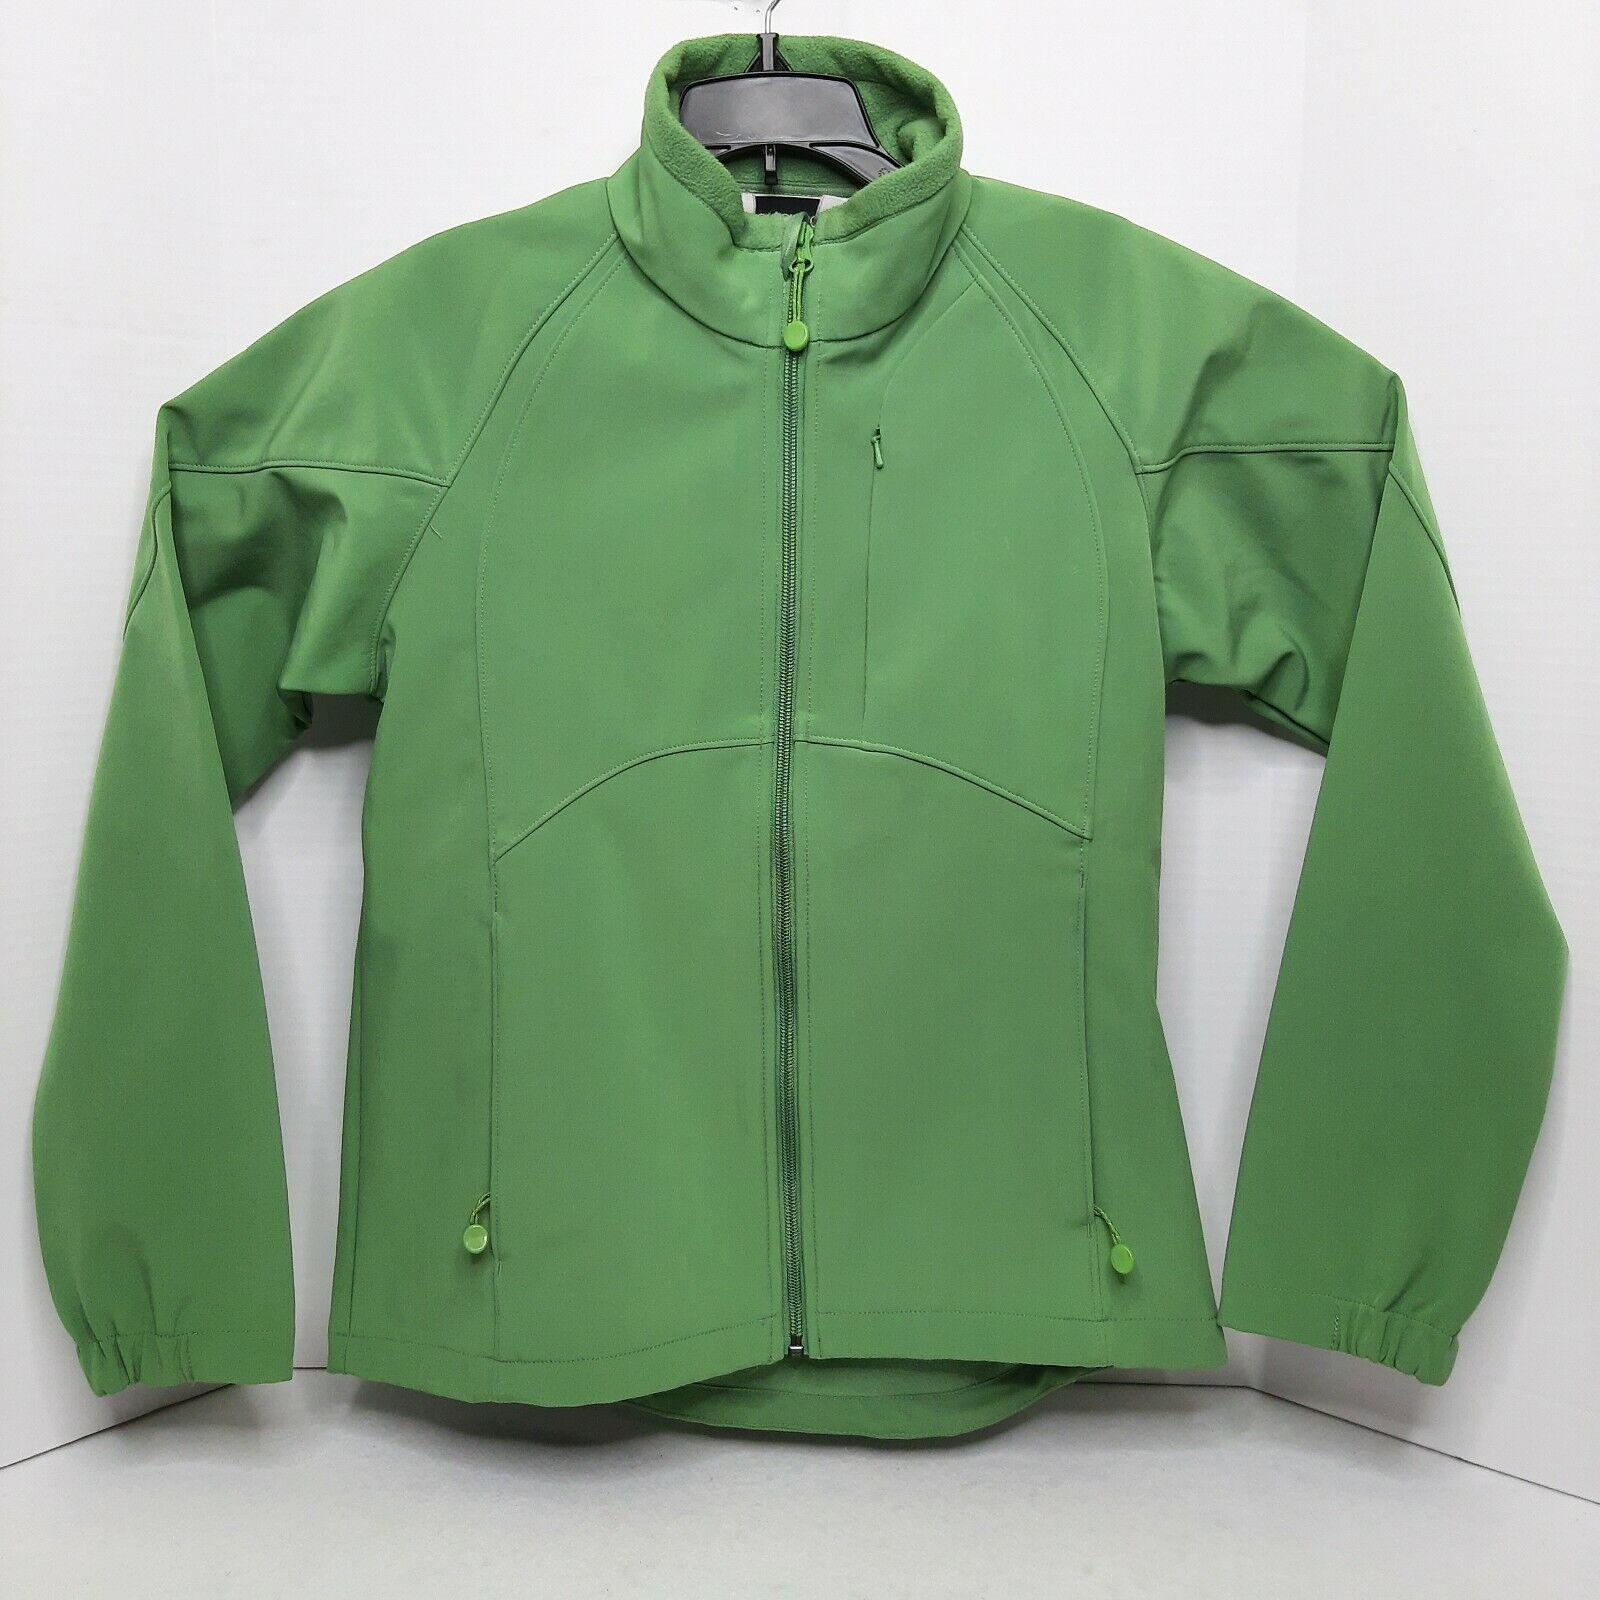 Black Diamond Women's Jacket Size Sm Soft Shell Fleece Lined Green Long Sleeve